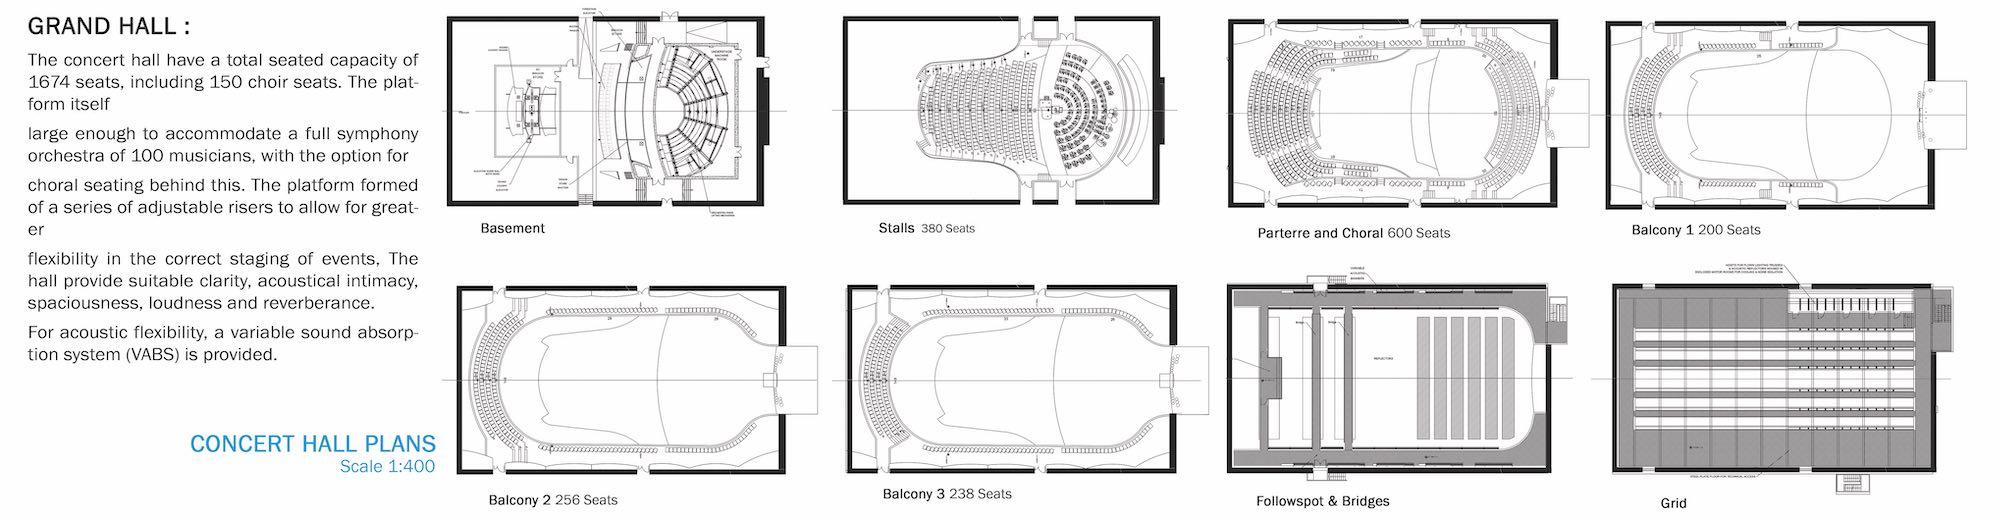 concert hall details in plan